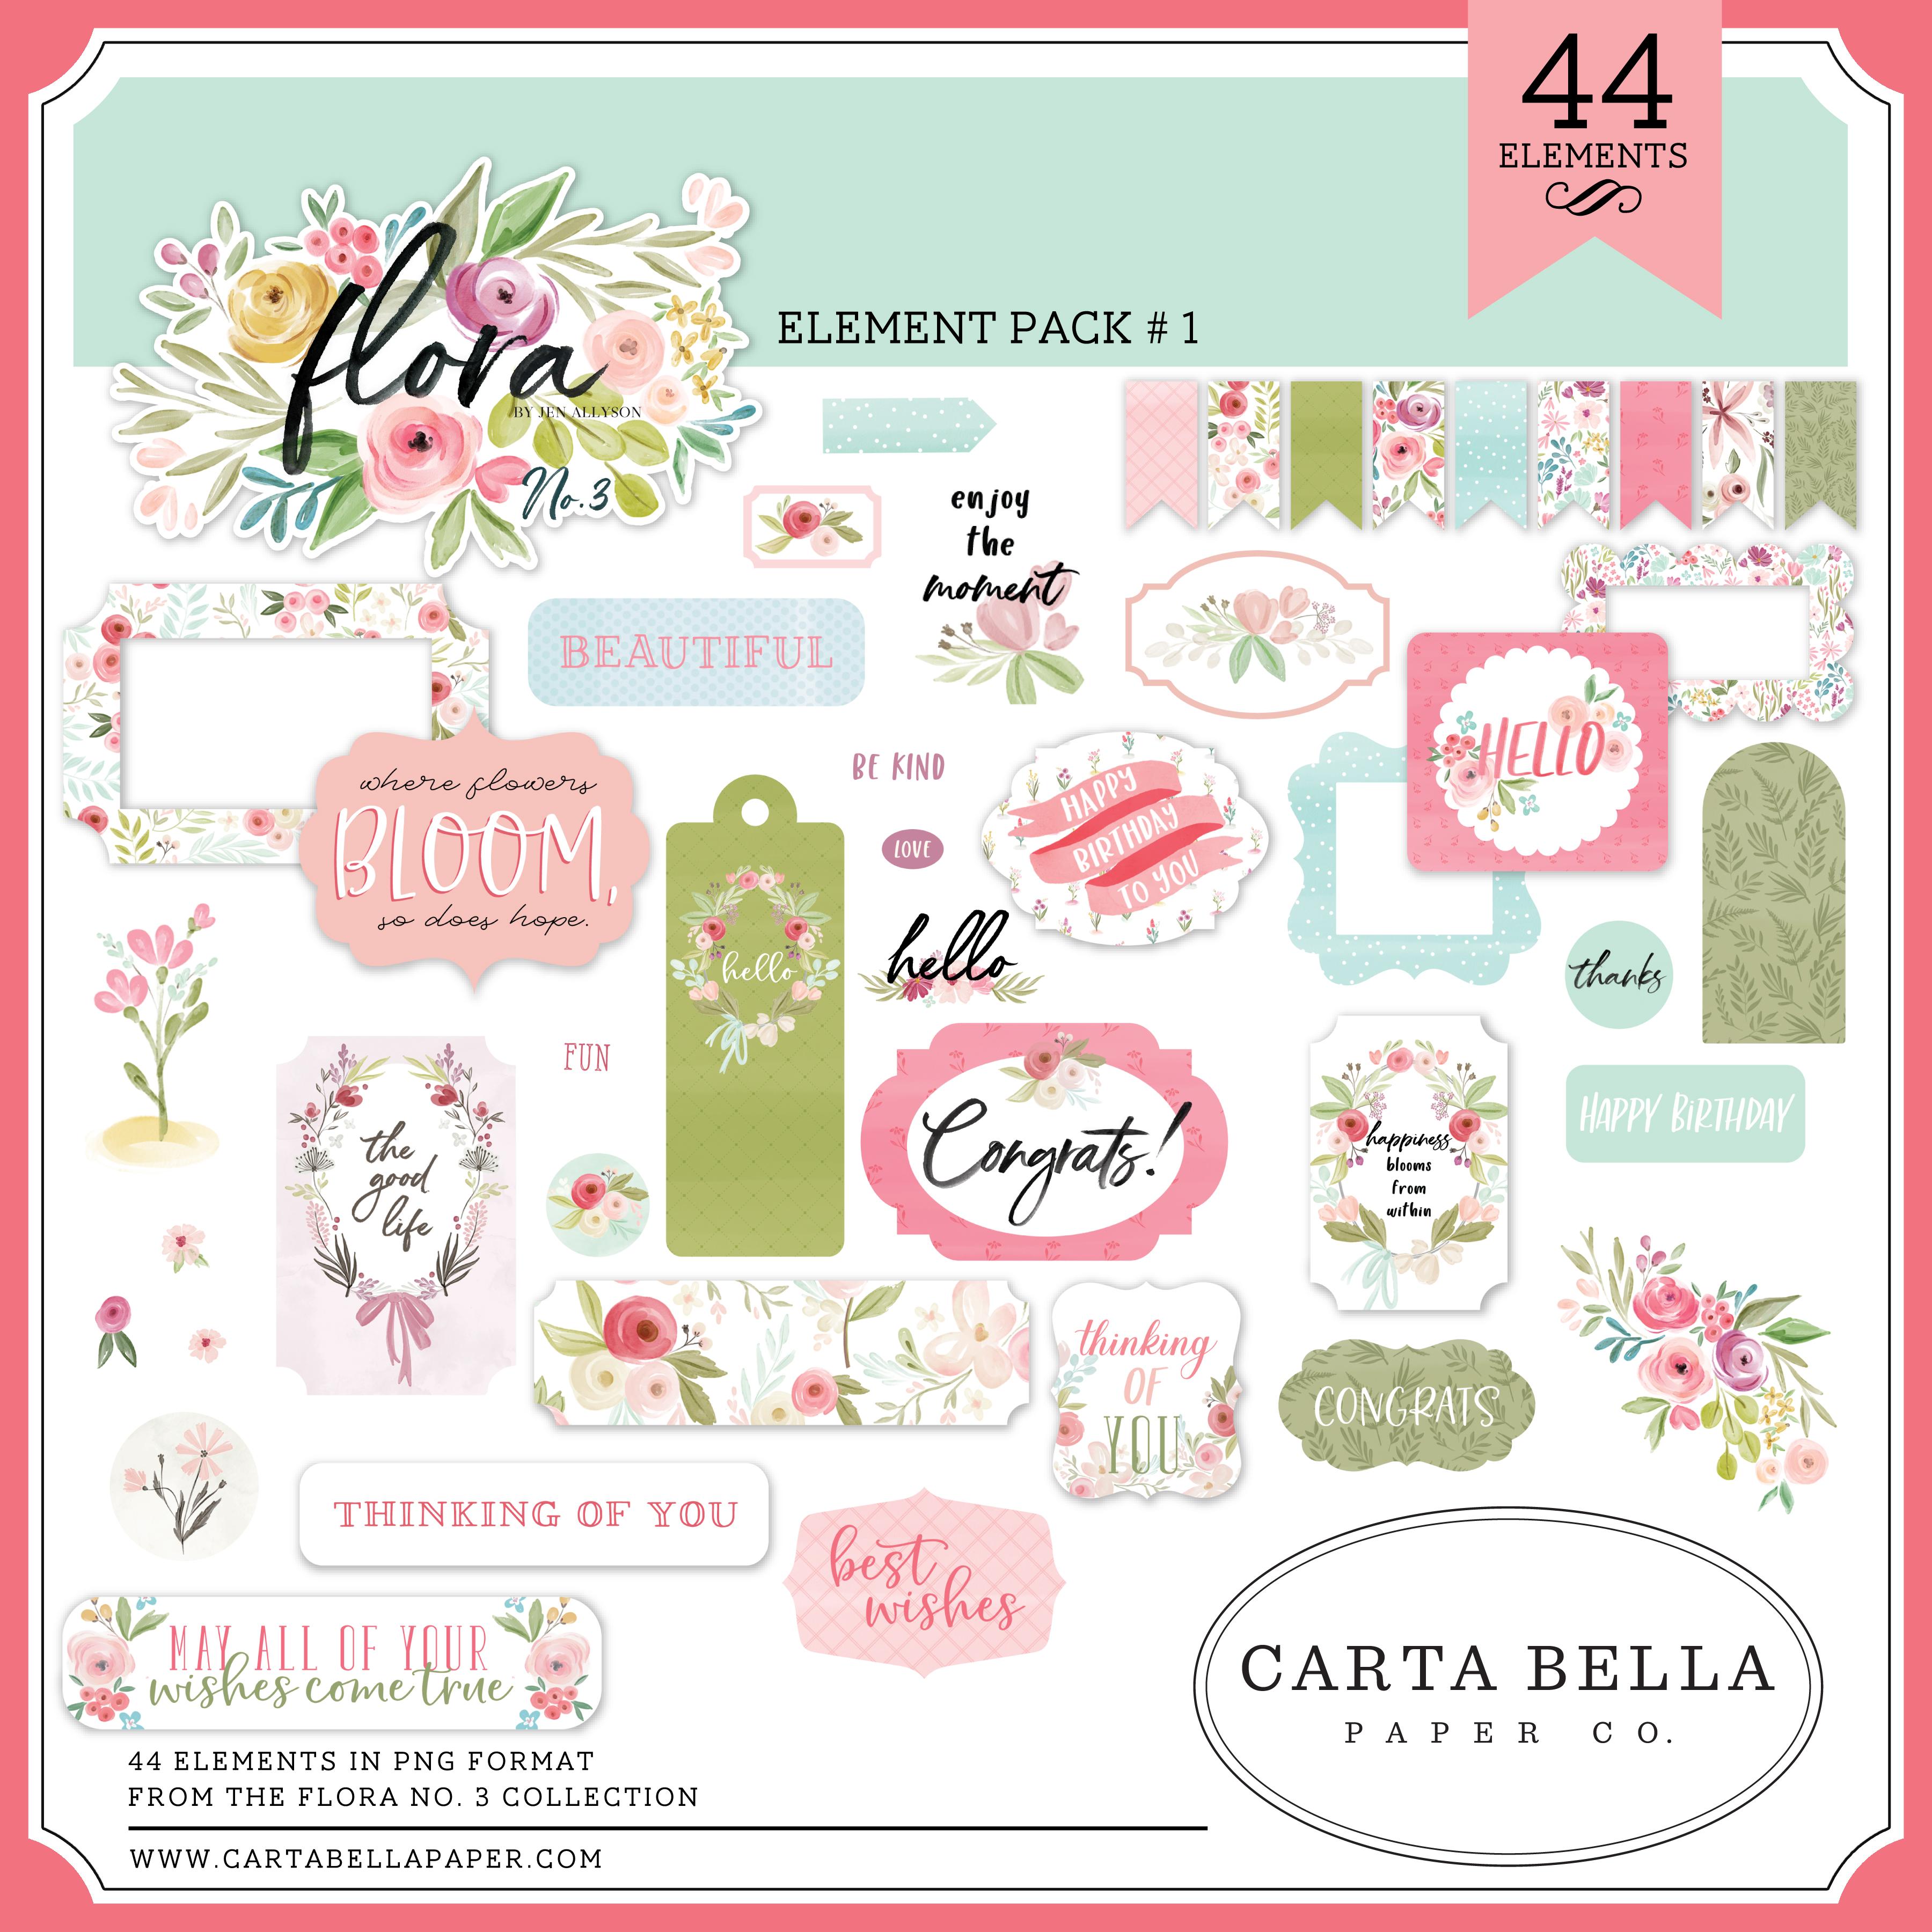 Flora No. 3 Element Pack #1